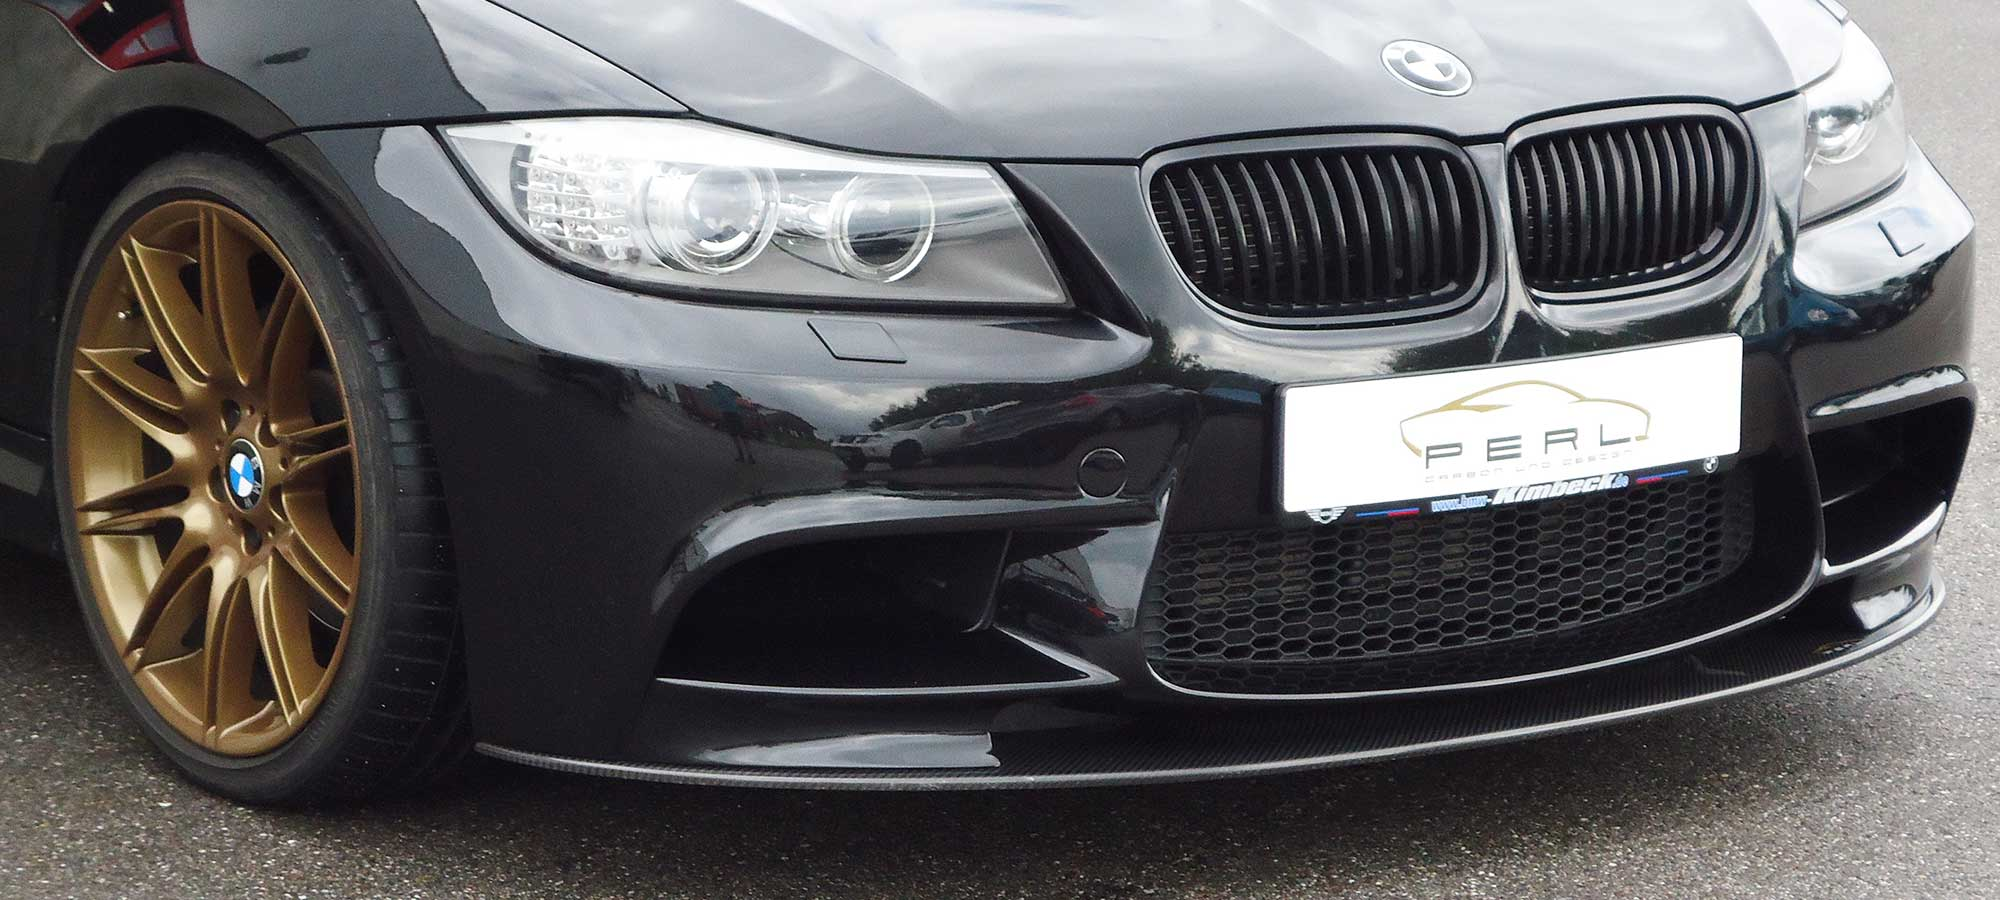 Carbonschwert BMW